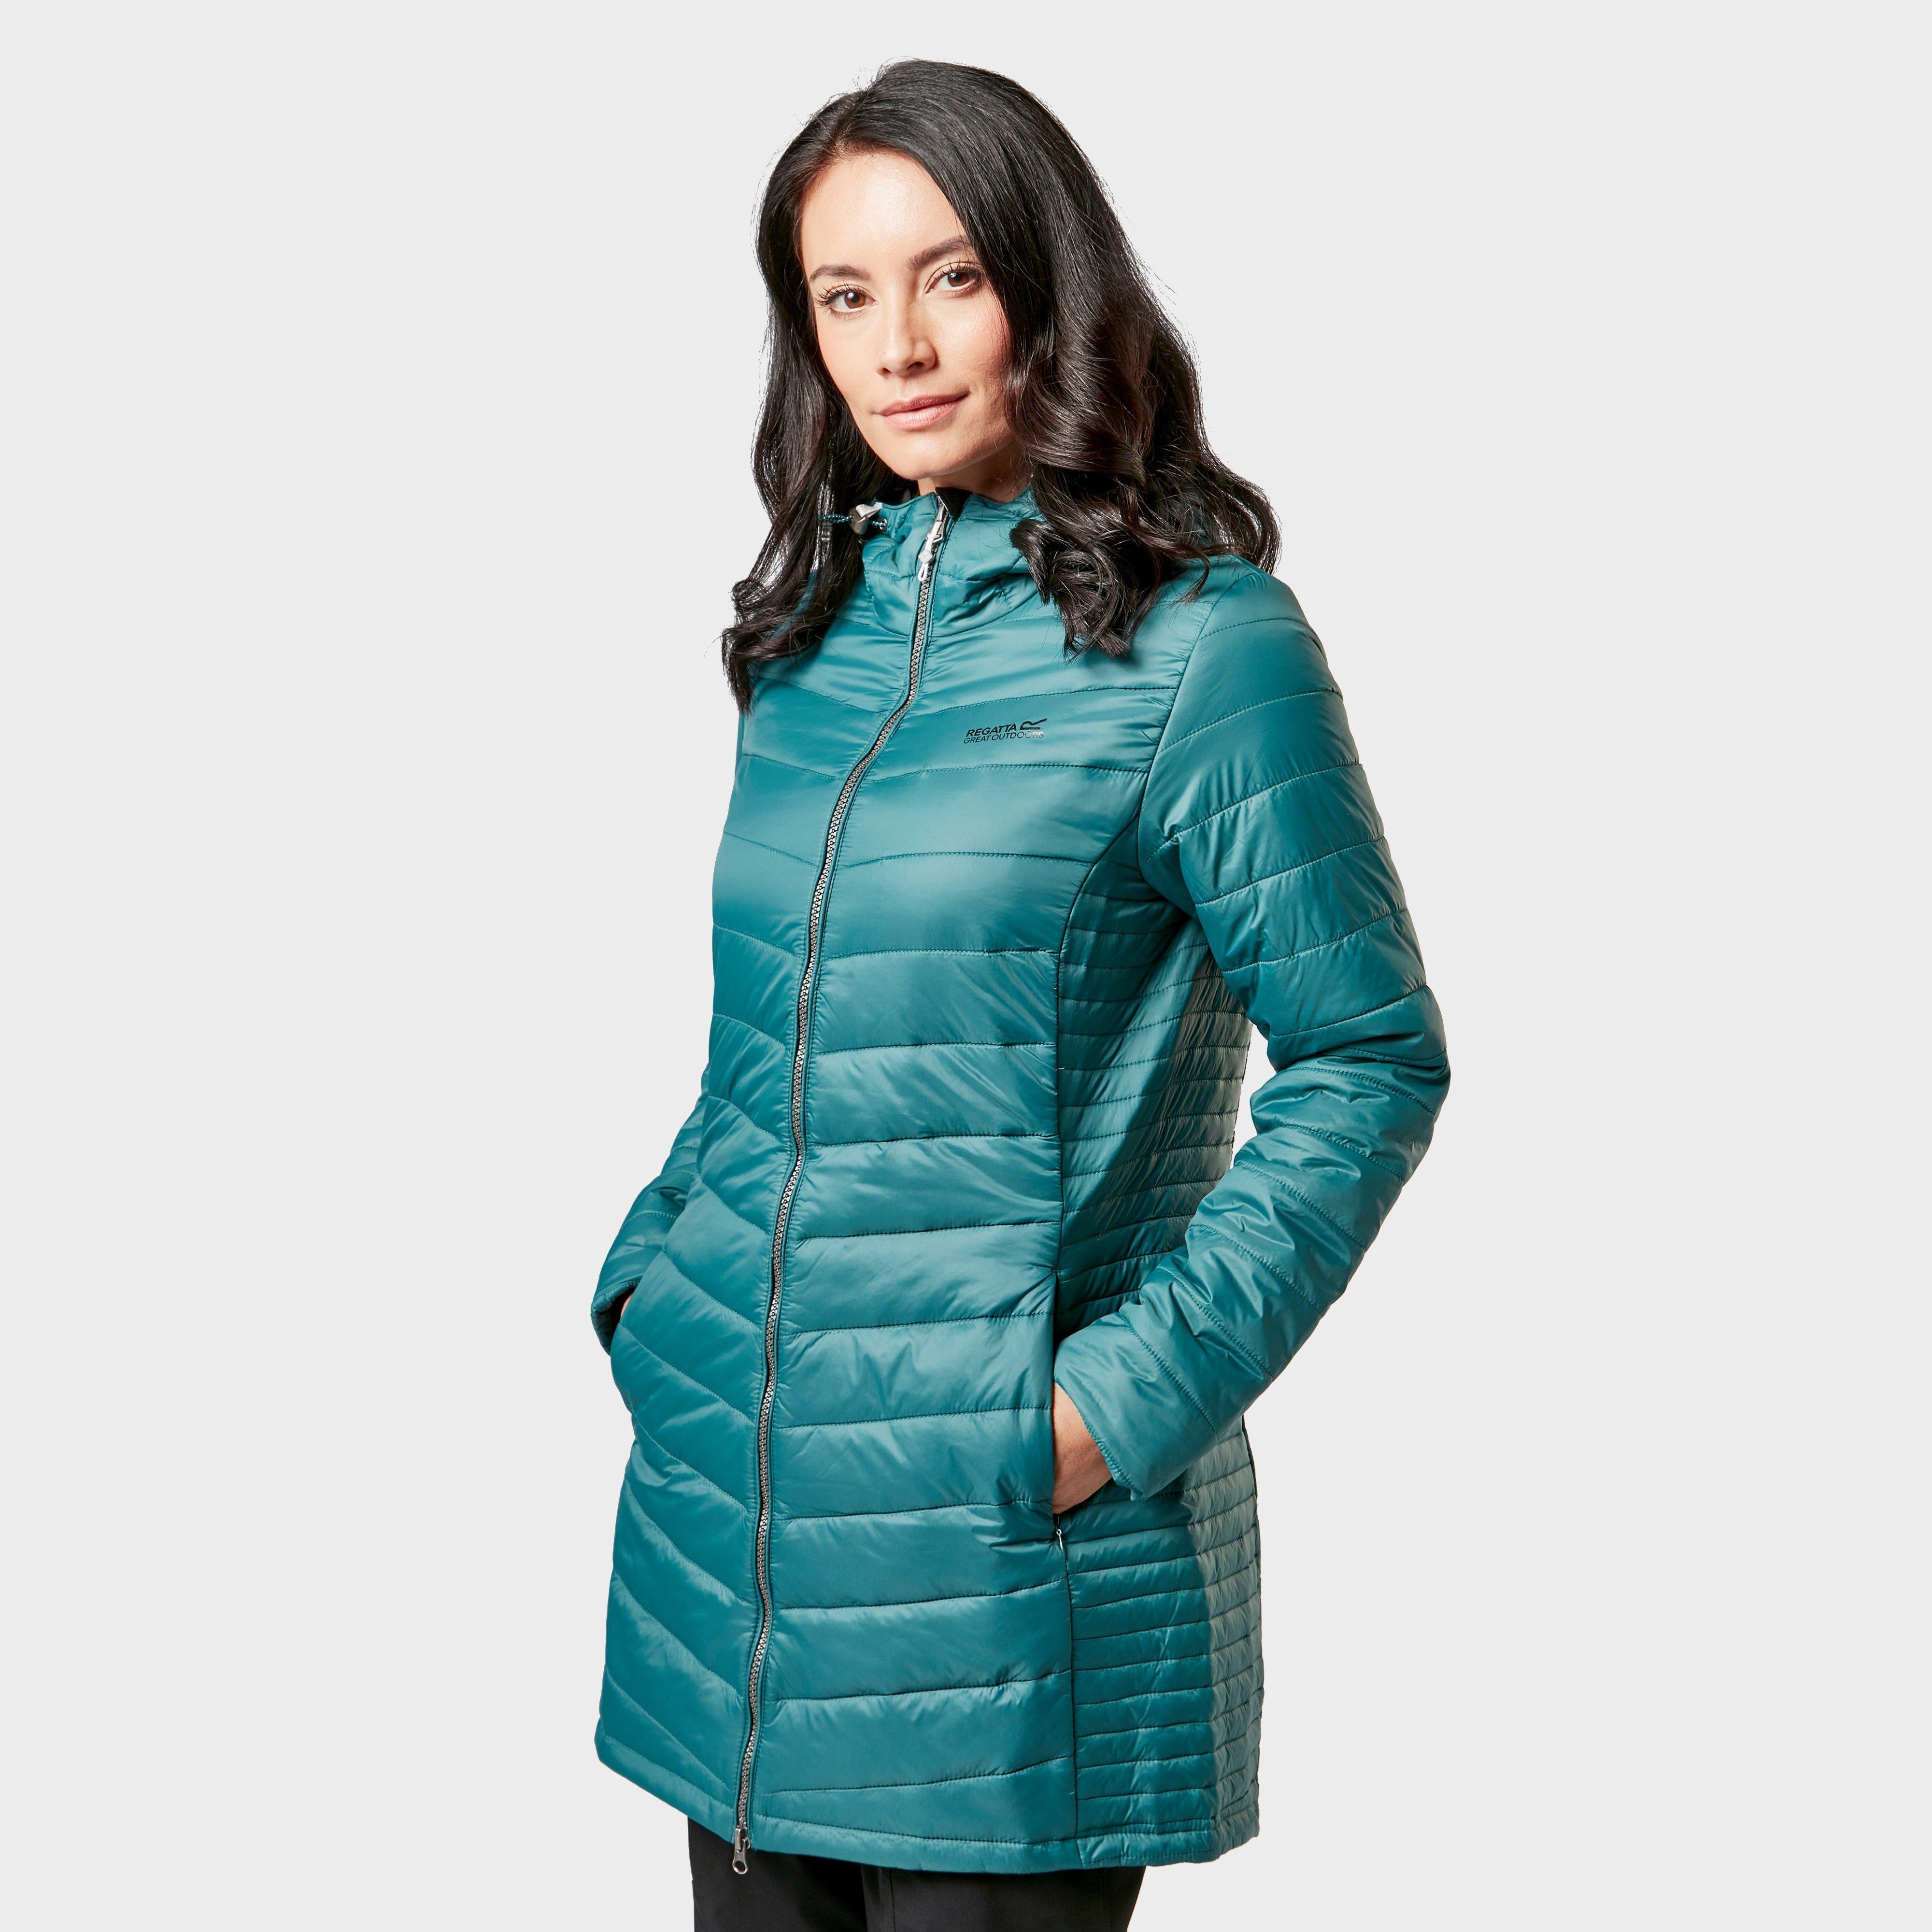 Regatta Regatta Womens Beaudine Long Baffle Jacket - Blue, Blue